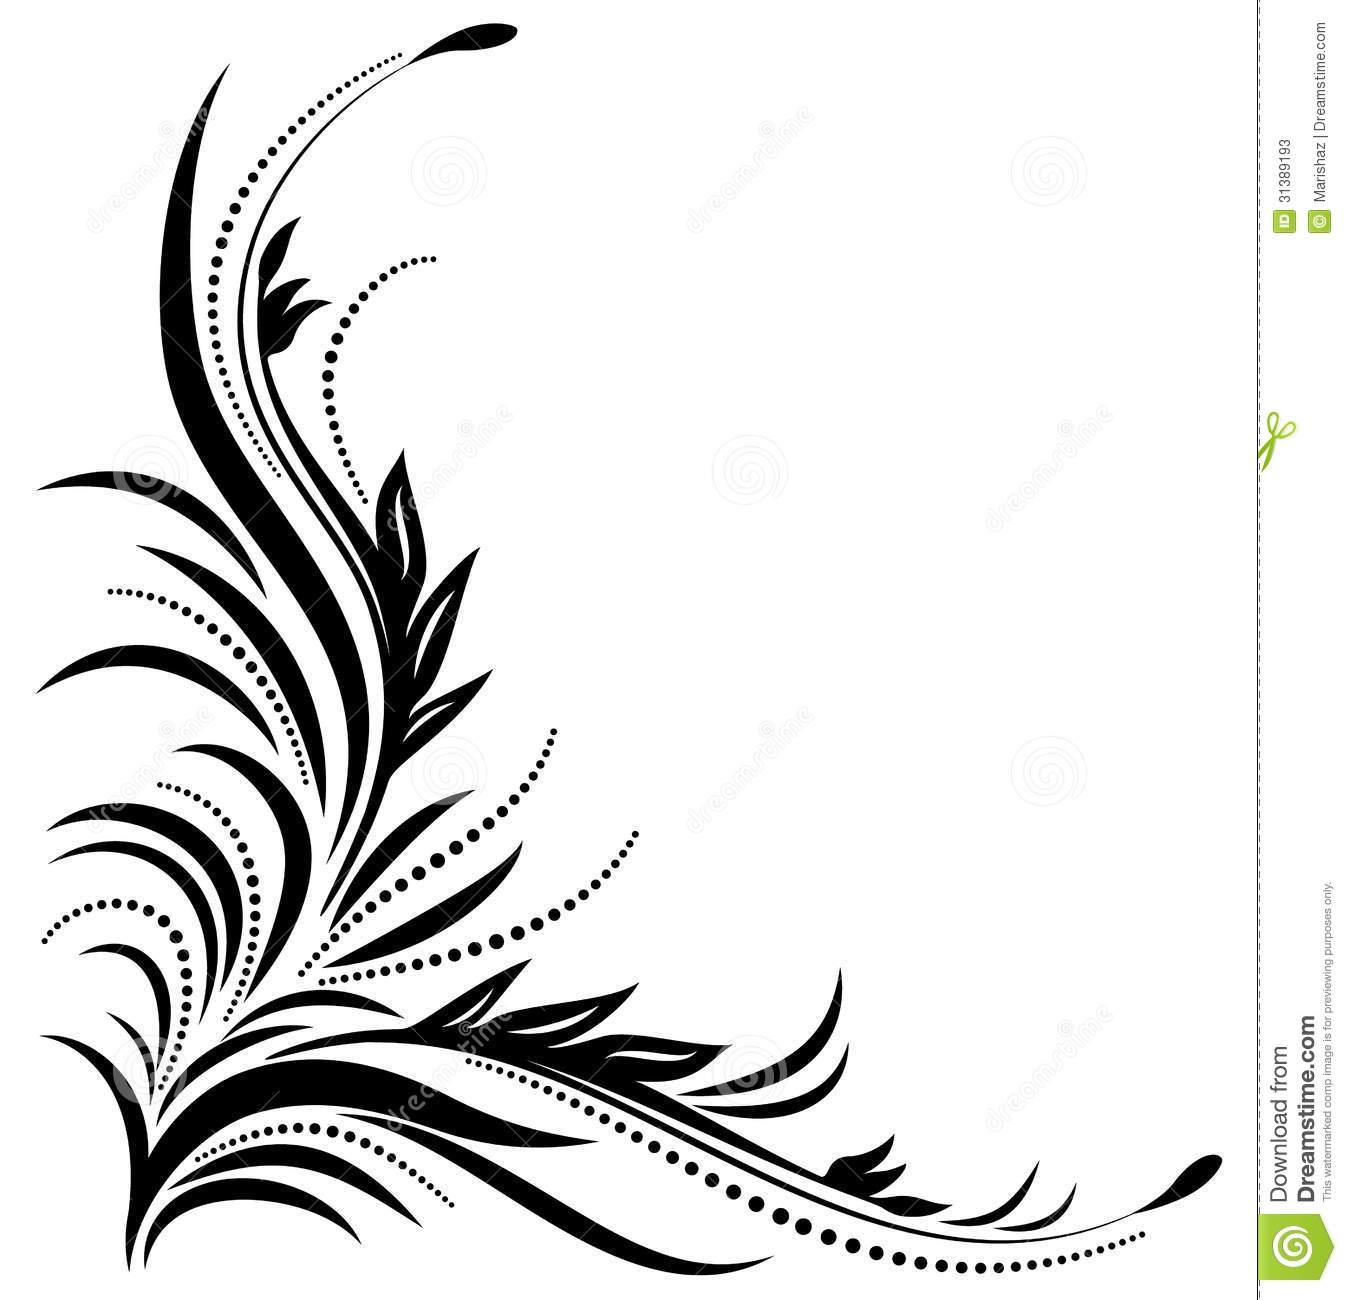 1347x1300 Decorative Corner Ornament Illustration Black Floral Patterns